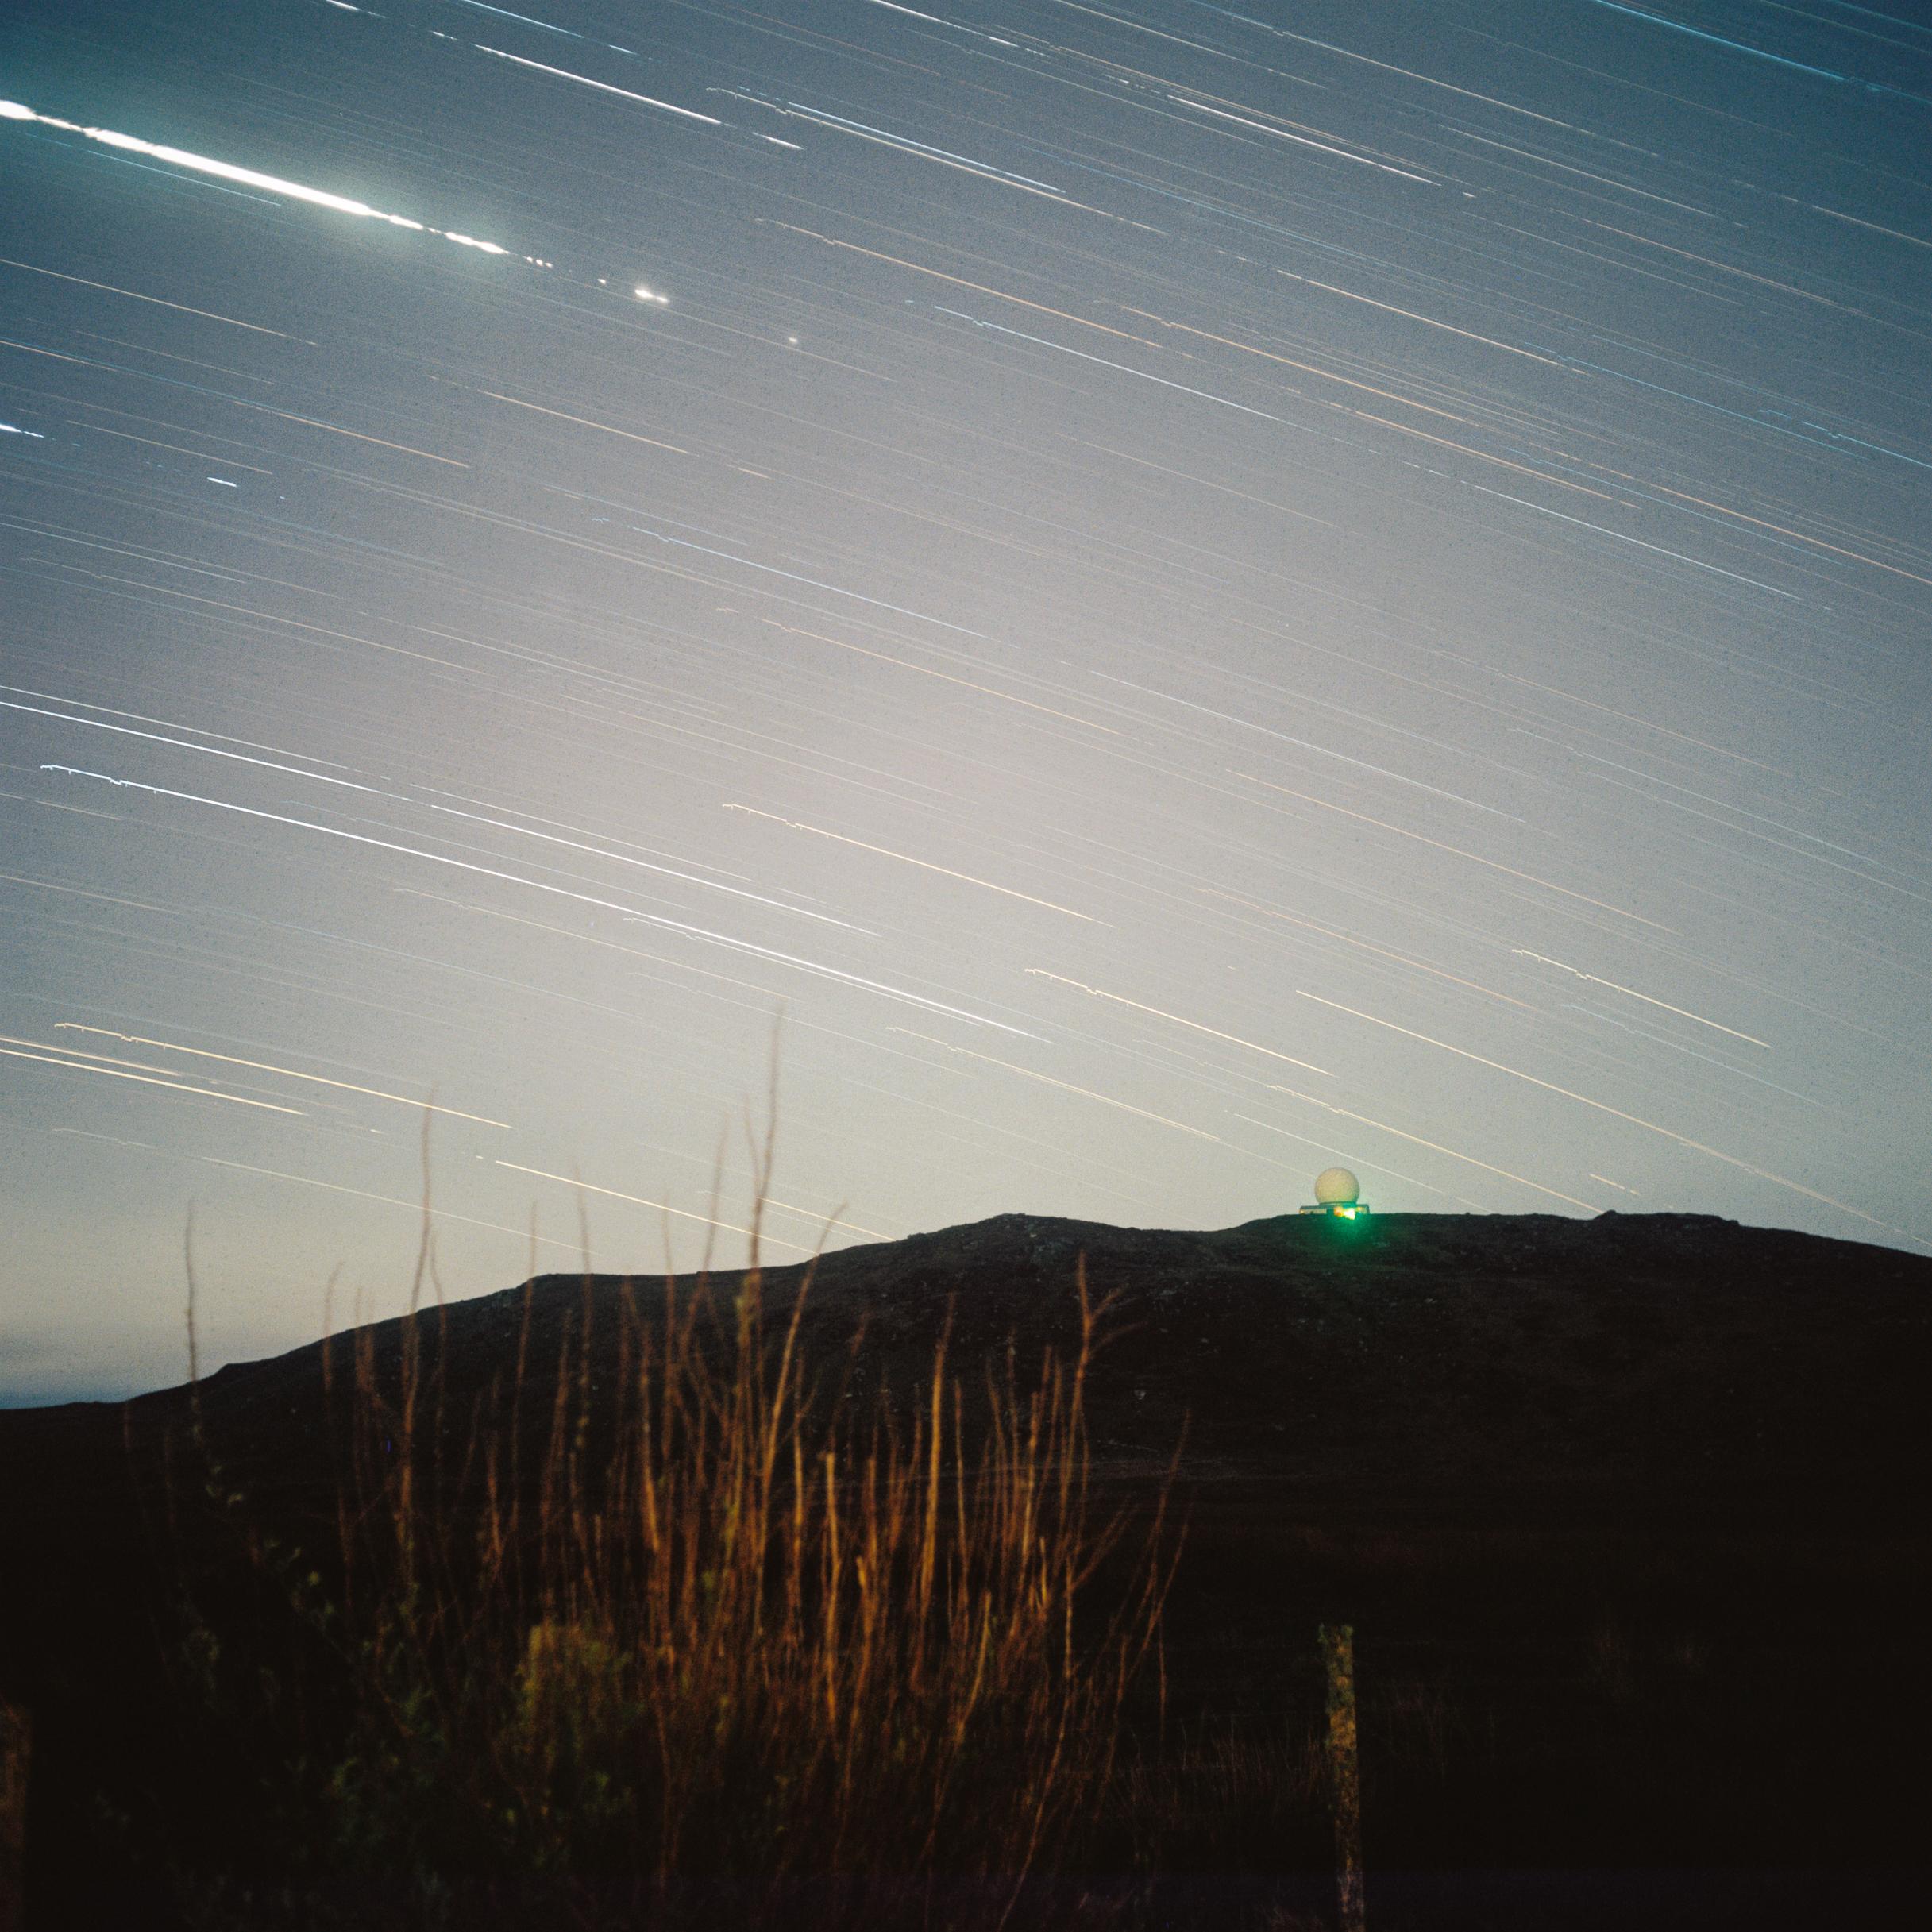 Radar Love | Rolleicord VB | Fuji Pro 400H | Michael Rennie